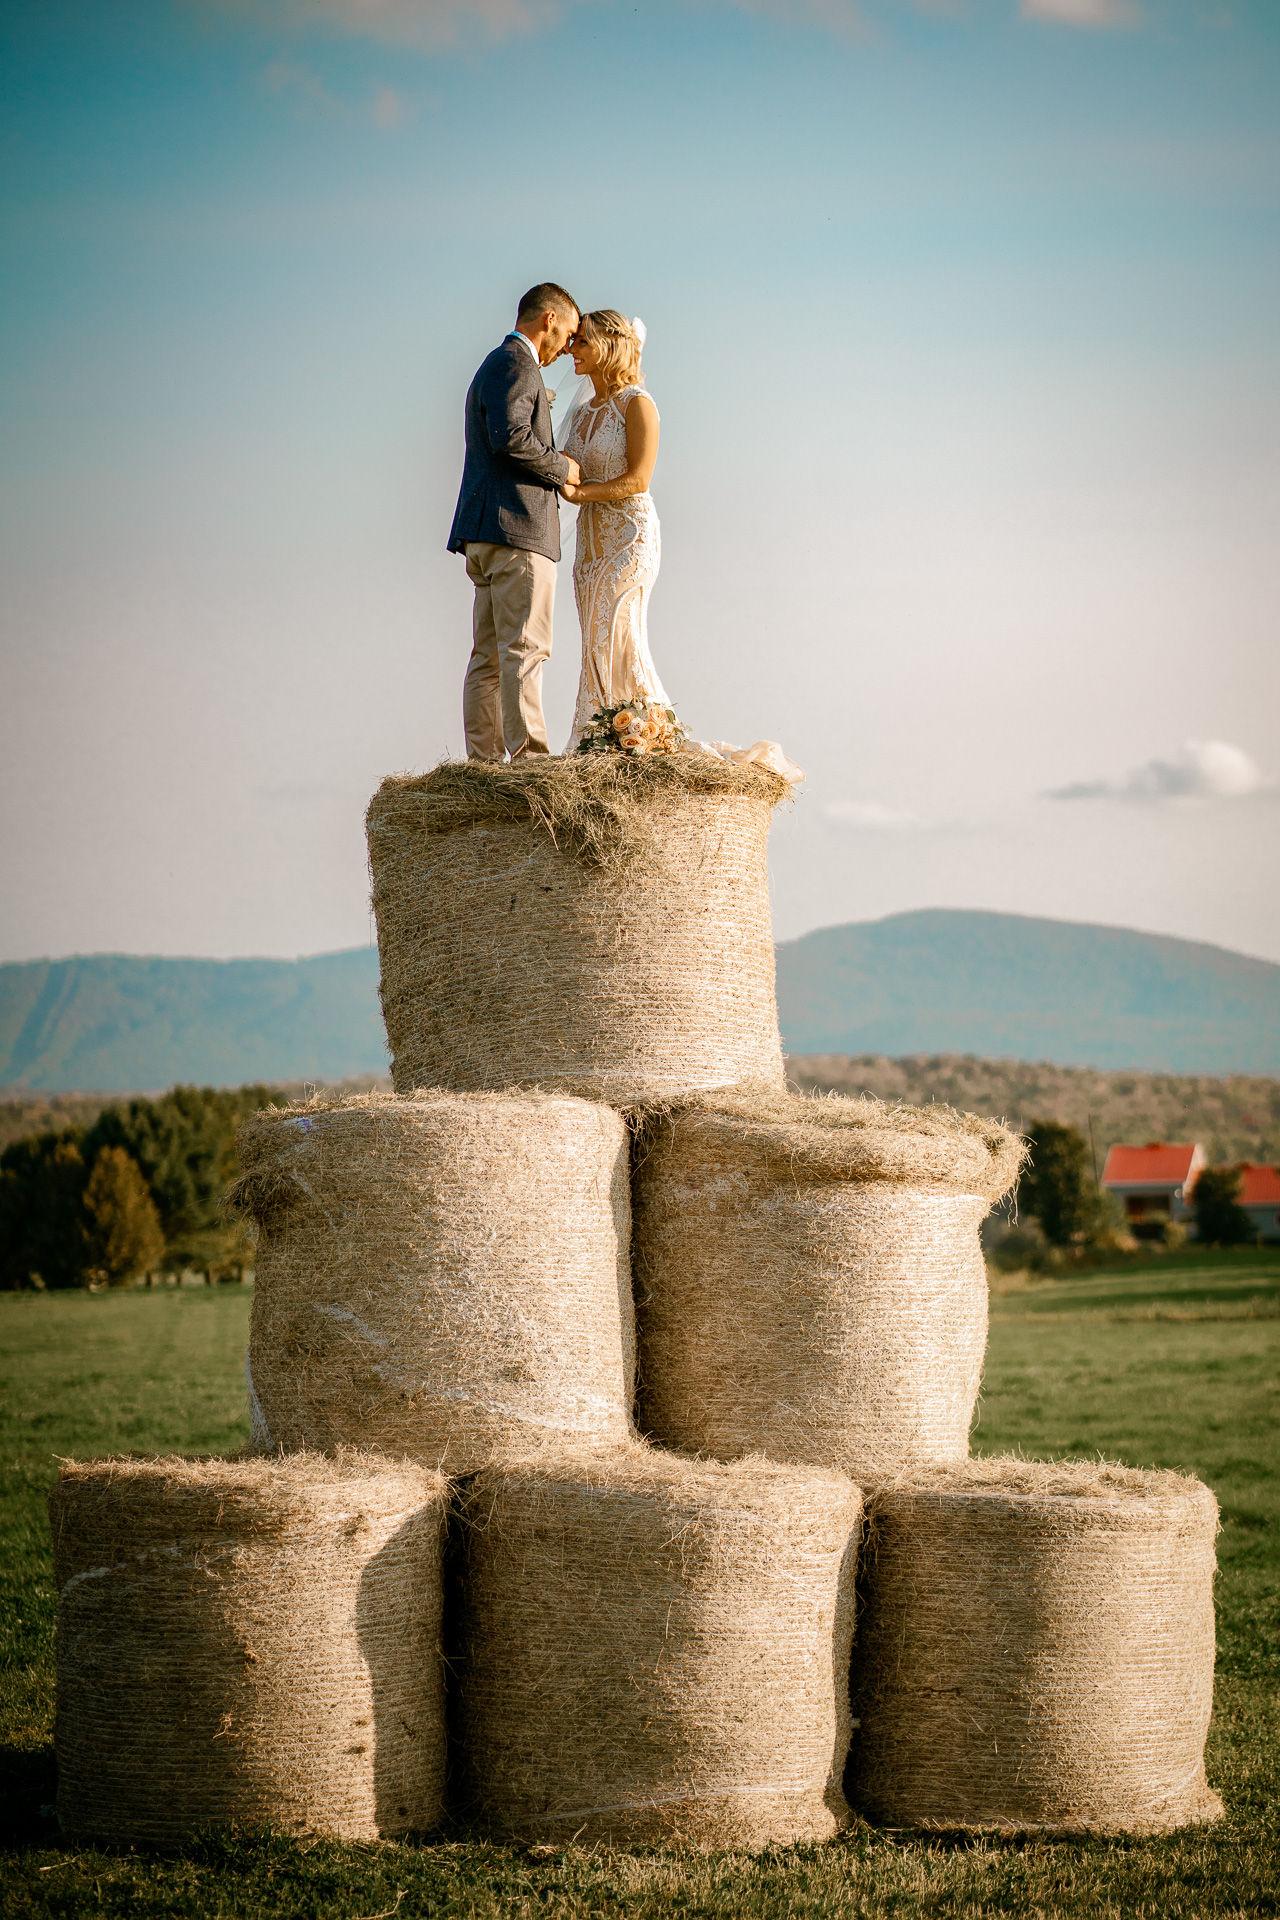 mariage ferme rustique quebec photo mariage